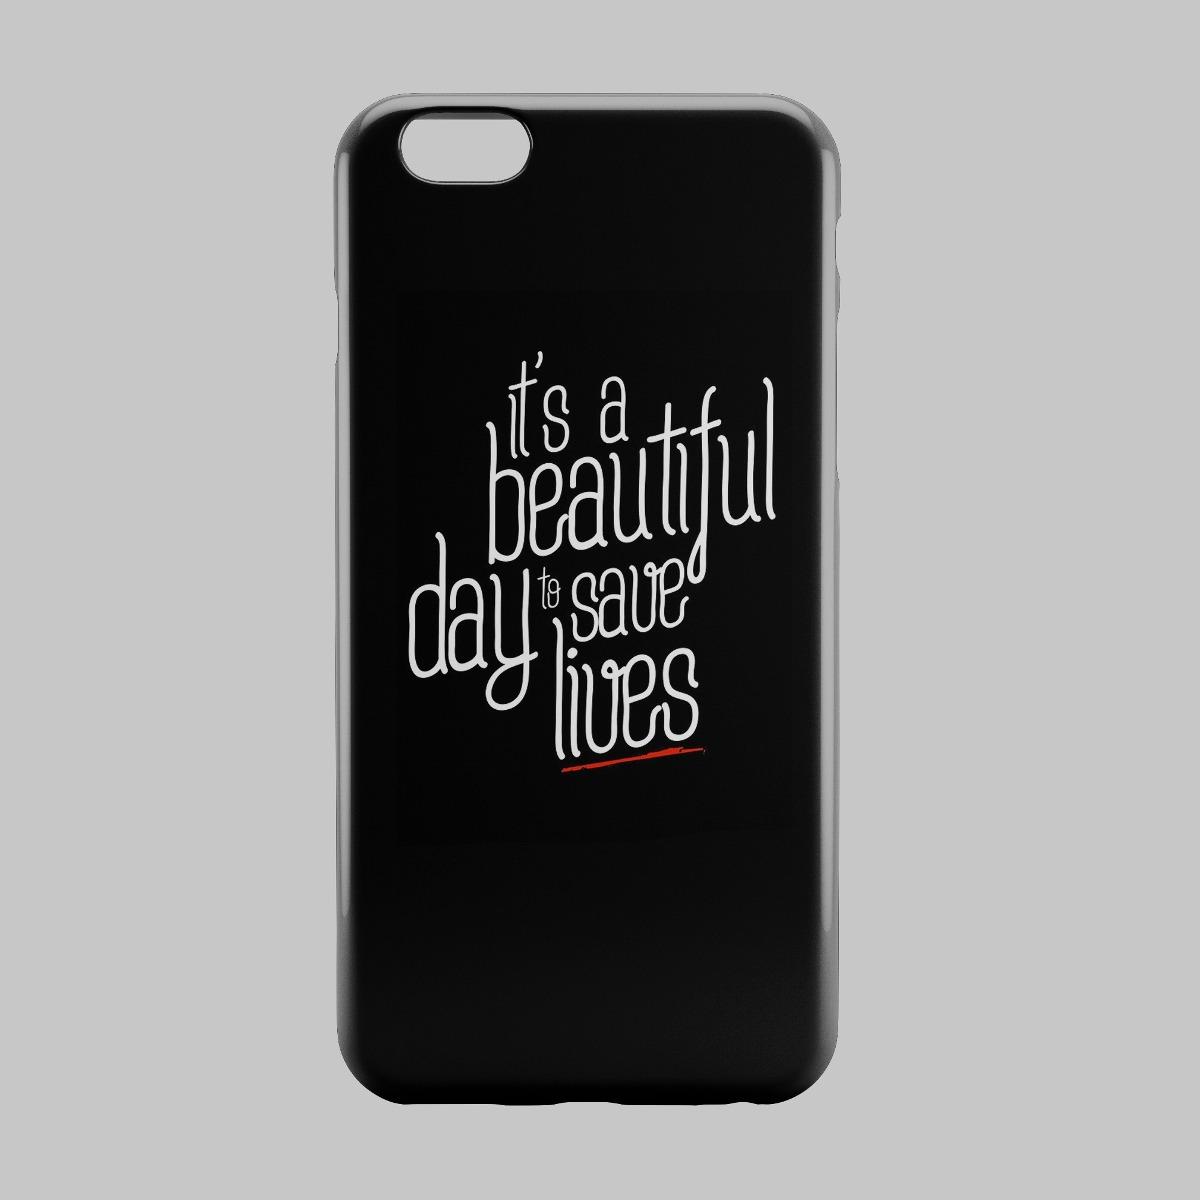 Capinha Série Grey\'s Anatomy Iphone 4 4s 5 5s 5c 6 6s 6 Plus - R$ 29 ...